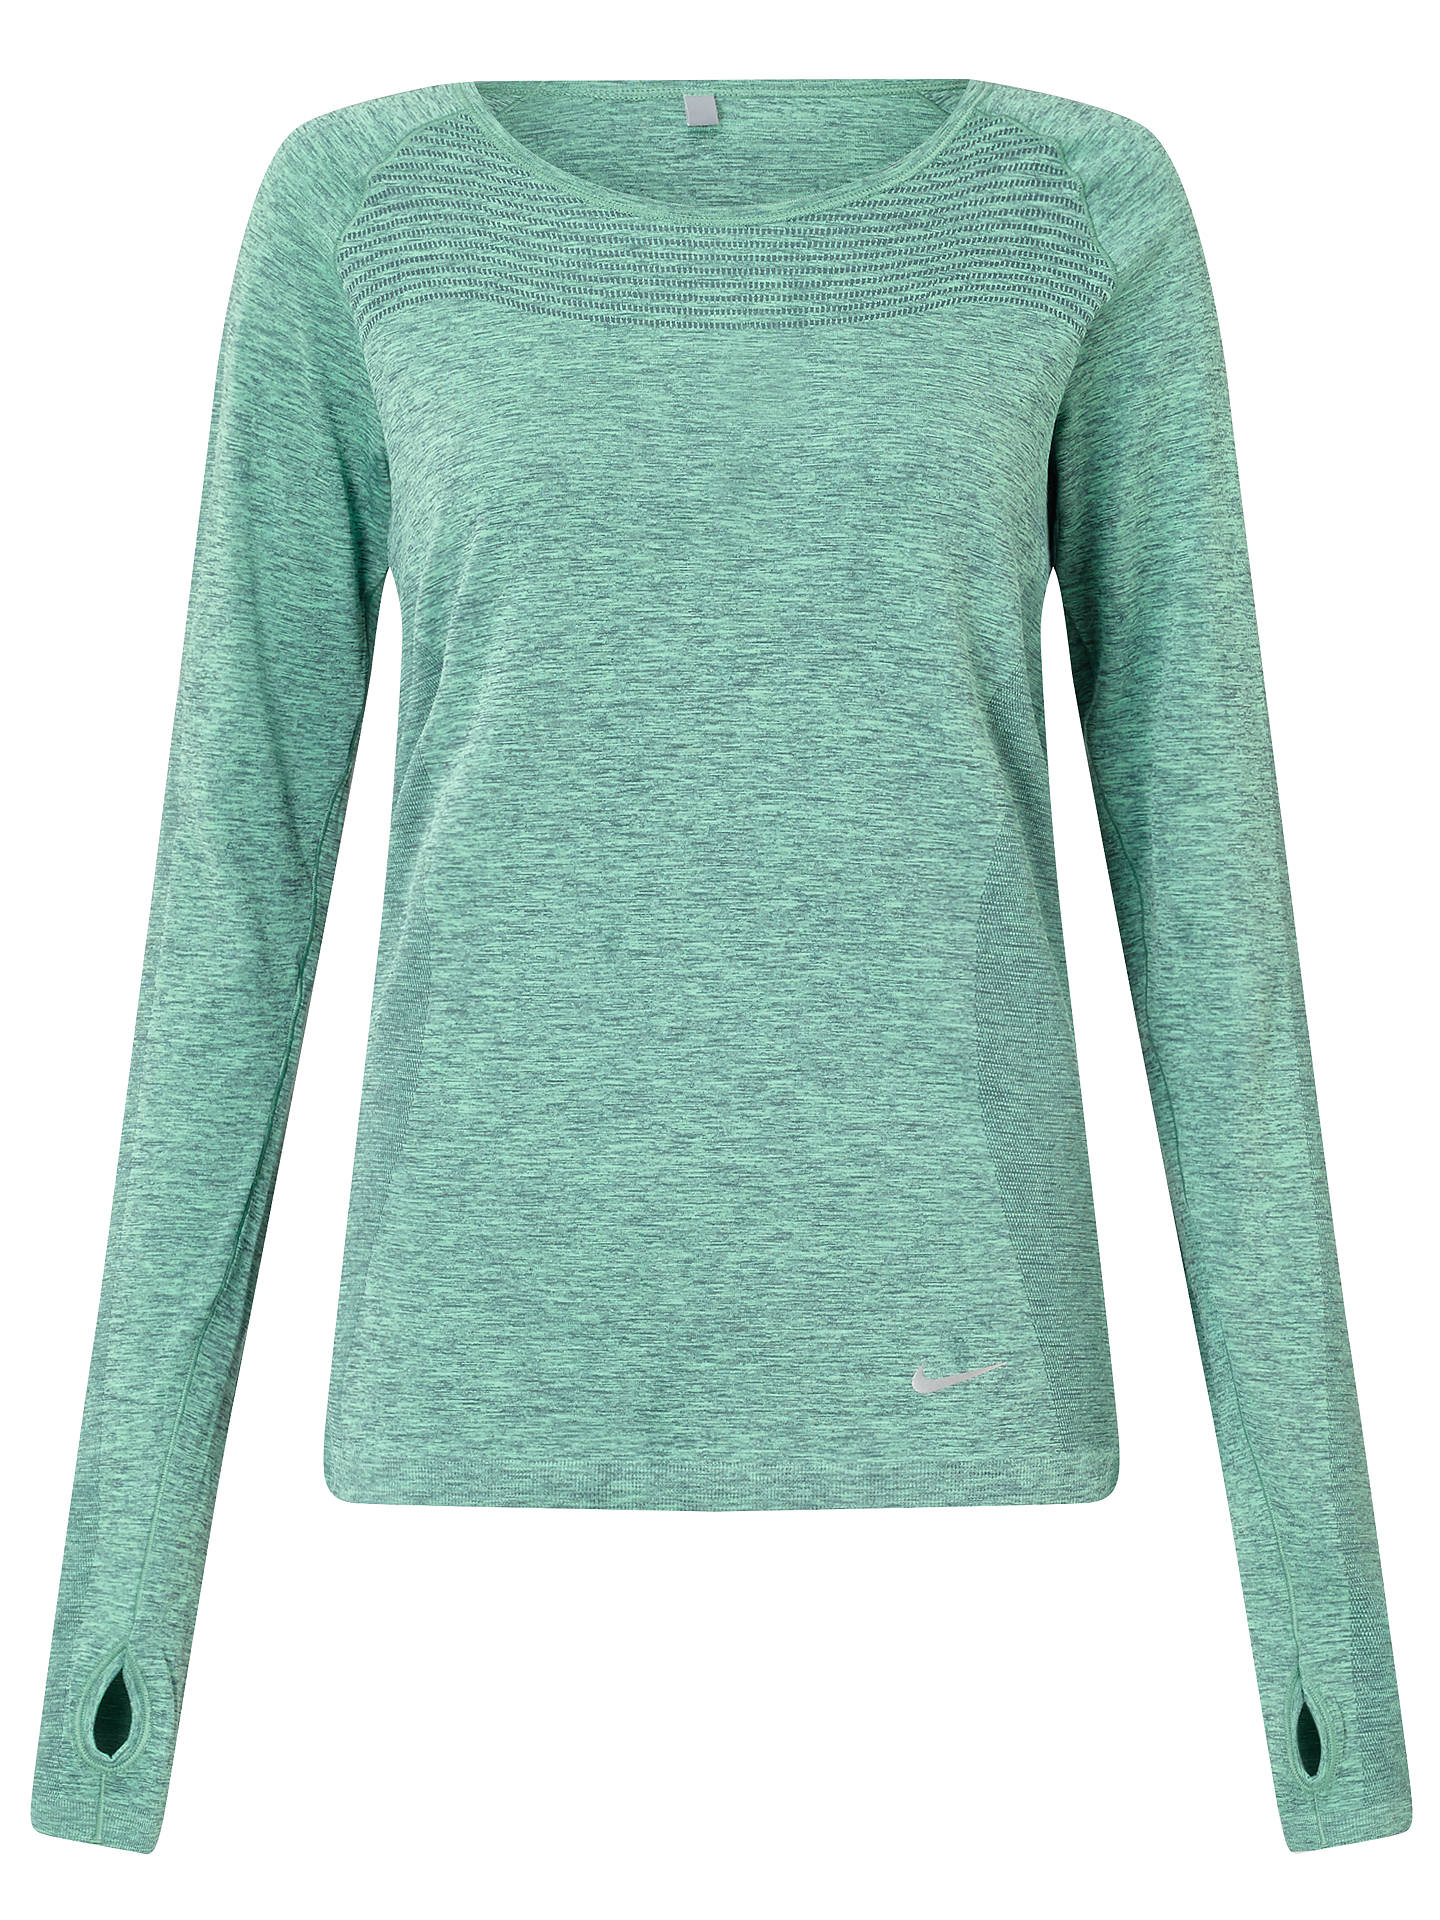 ddd4f0deb Buy Nike Dri-FIT Knit Long Sleeve Running Top, Hasta/Green Glow, ...